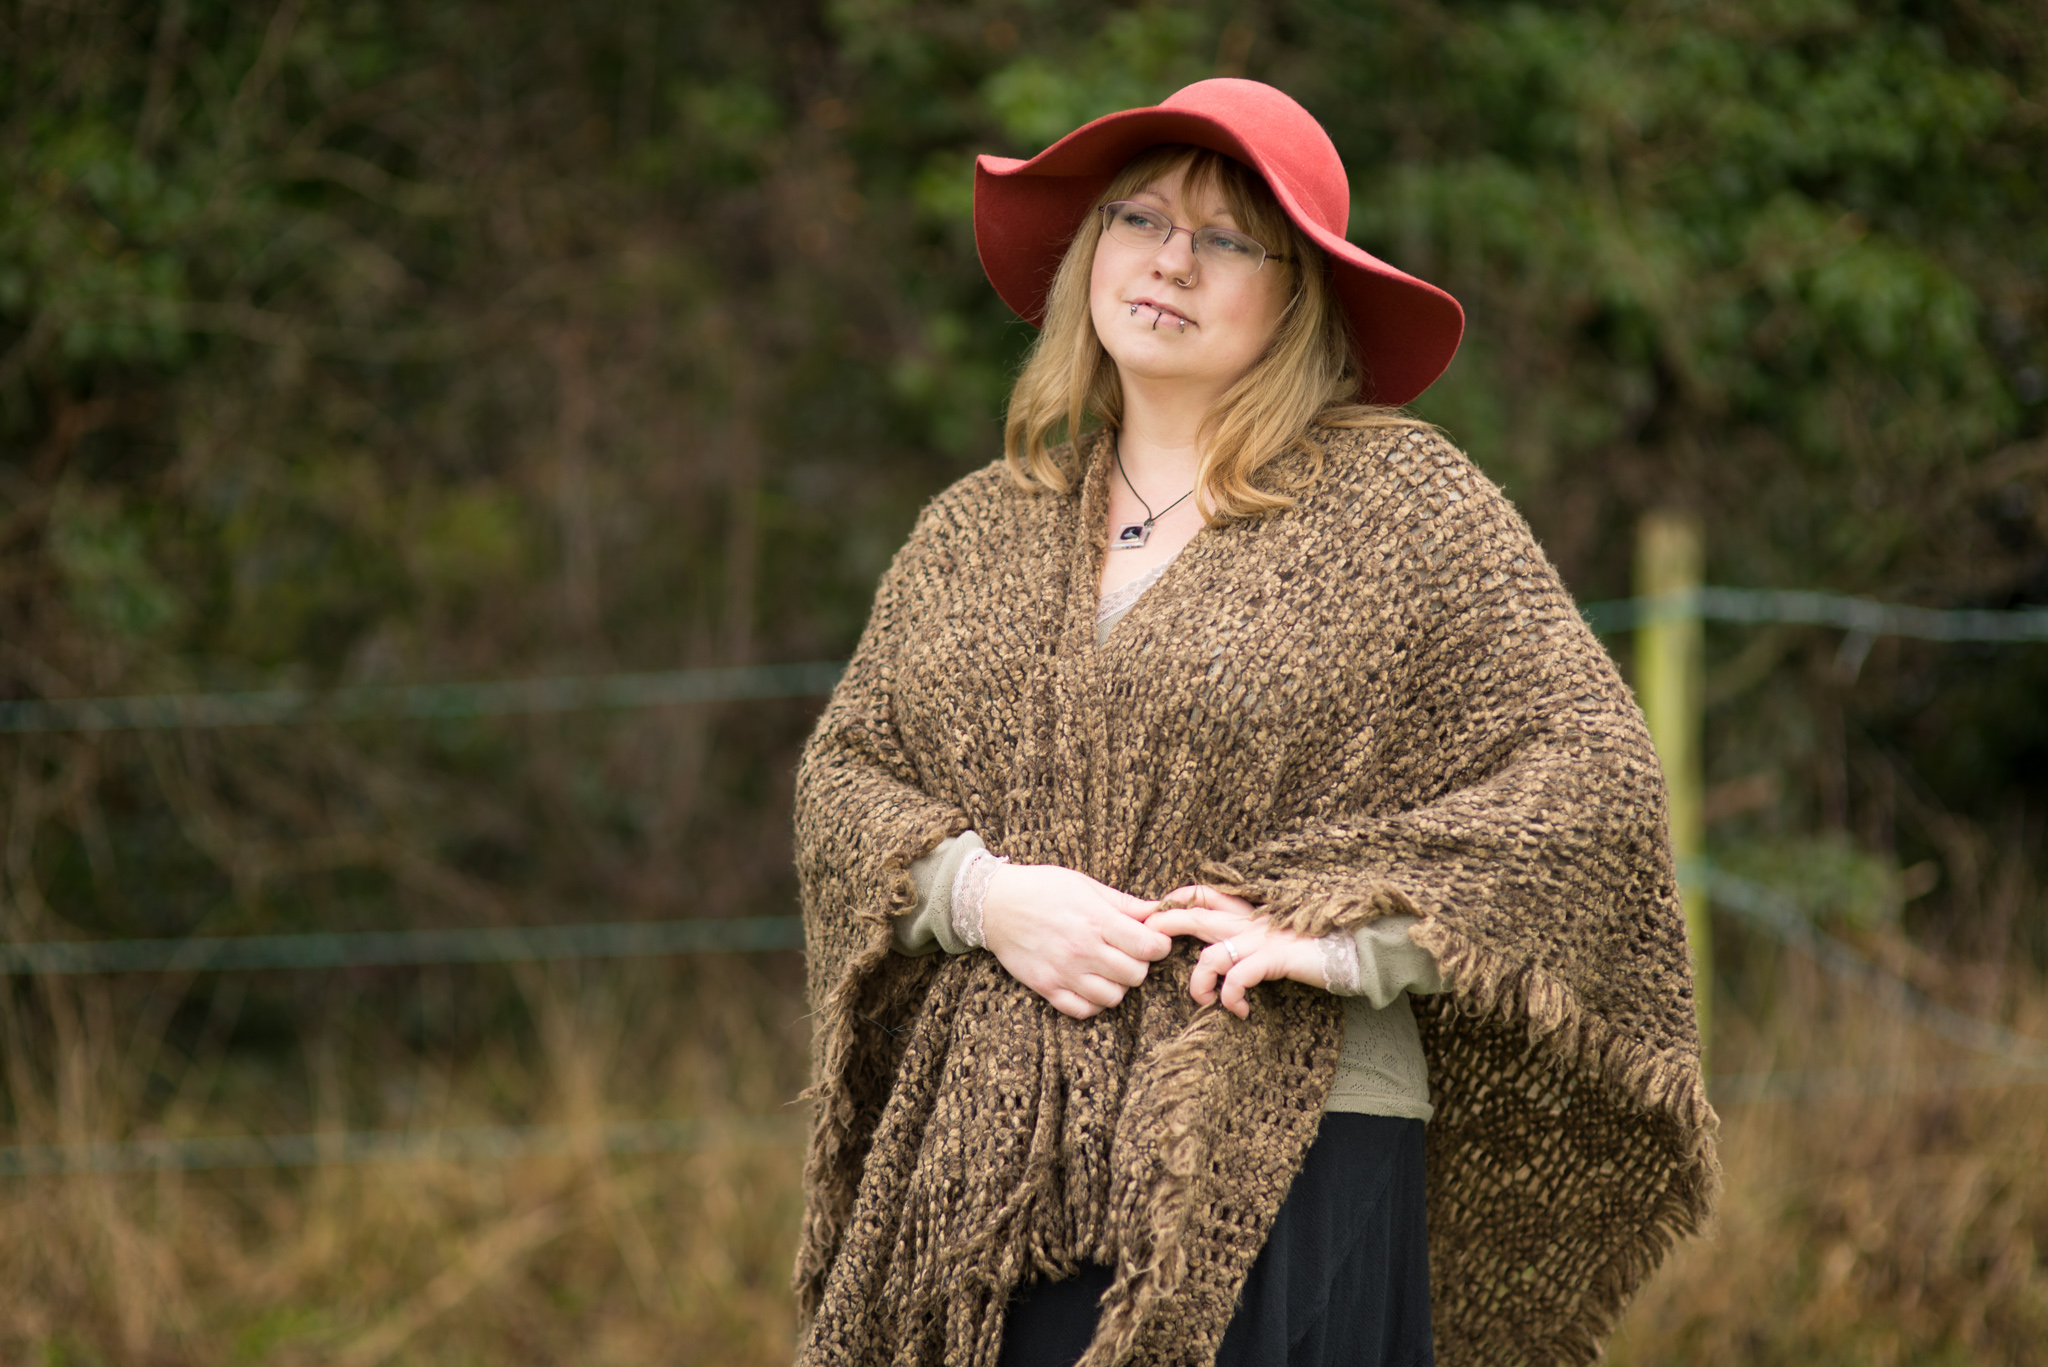 Weekly Wardrobe – floppy hat & maxi skirt